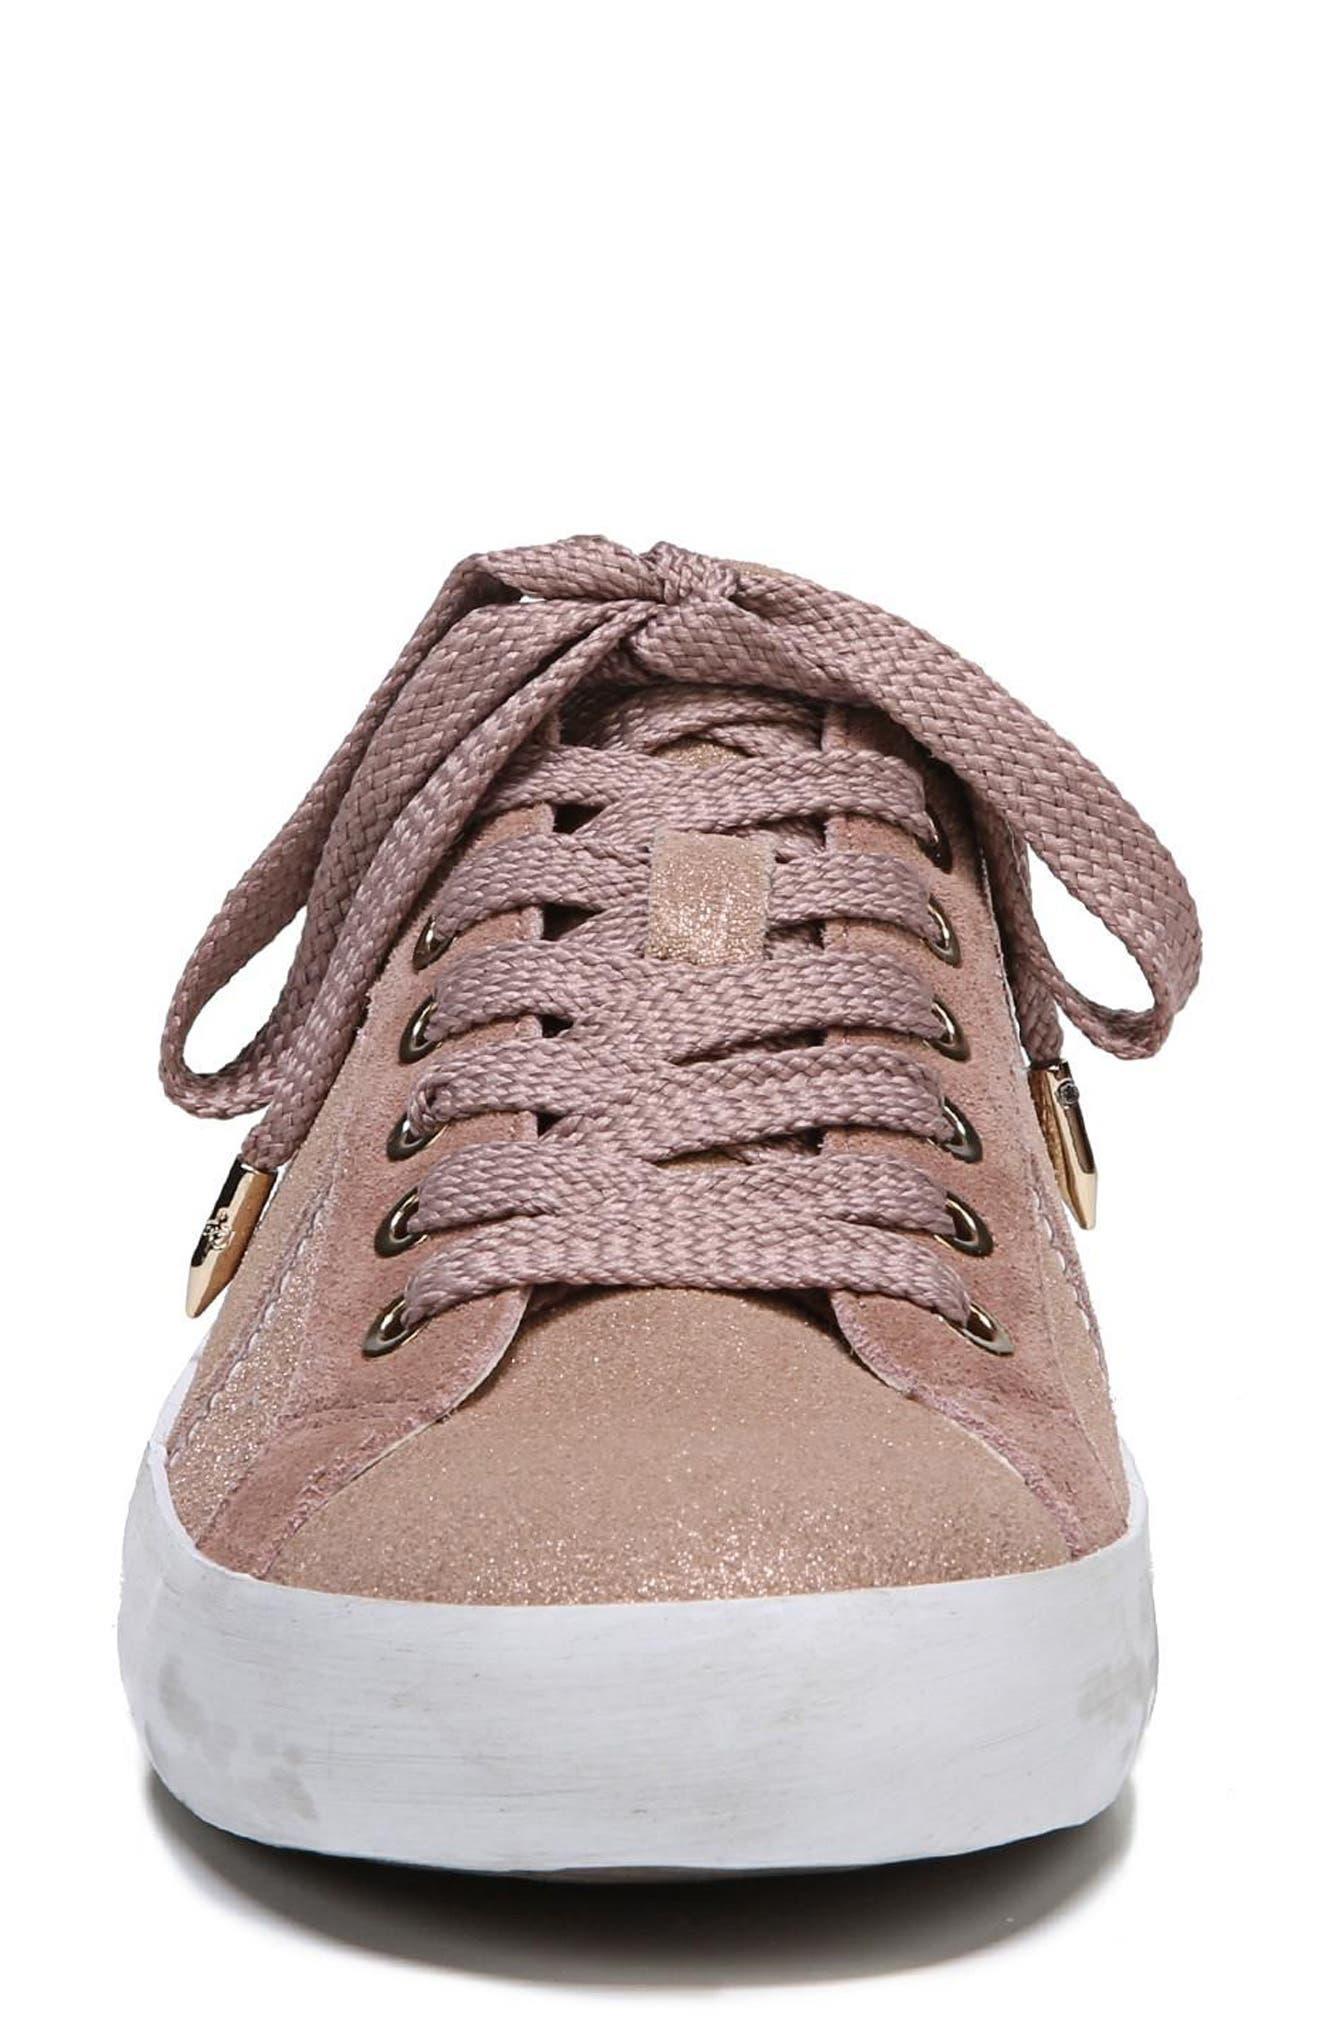 Baylee Sneaker,                             Alternate thumbnail 4, color,